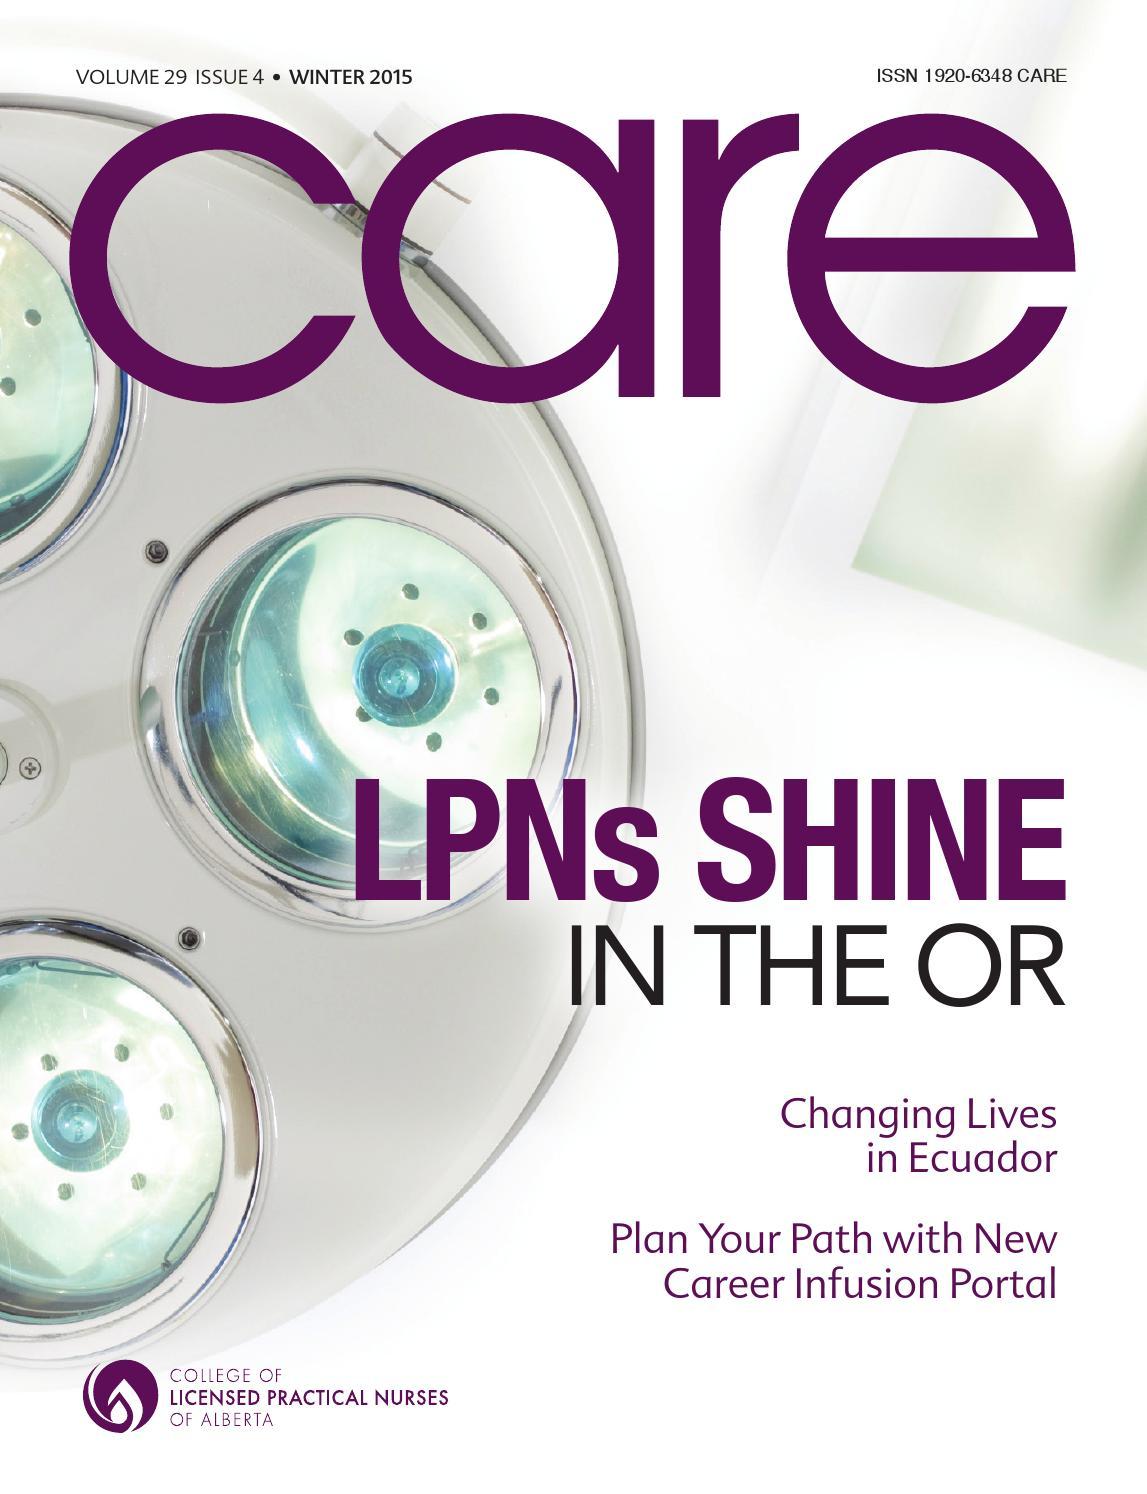 Graphic Design Articles Reprint